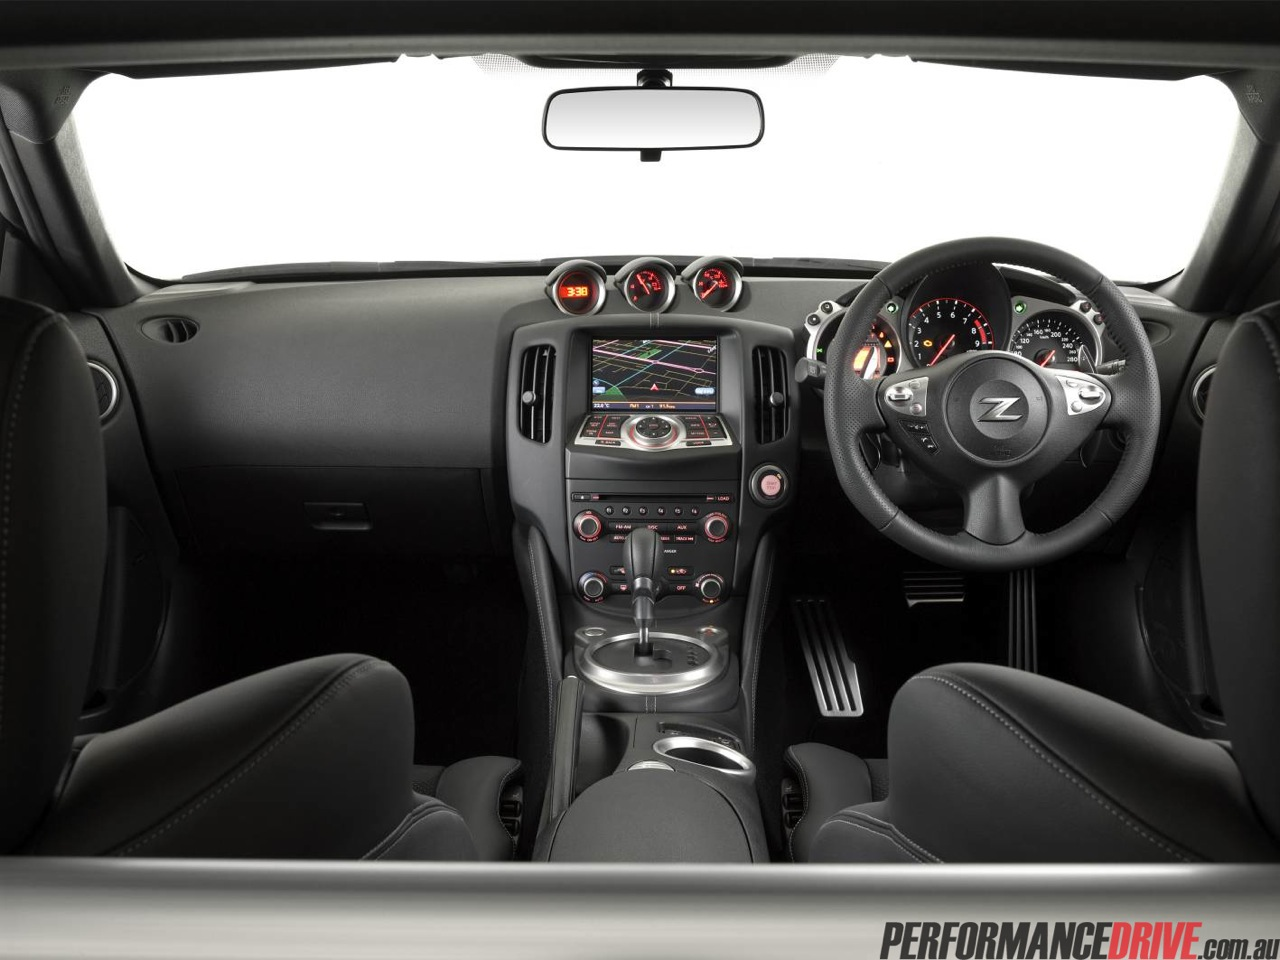 100 reviews 2011 nissan 370z coupe on margojoyo 2011 nissan 370z coupe review performancedrive vanachro Gallery